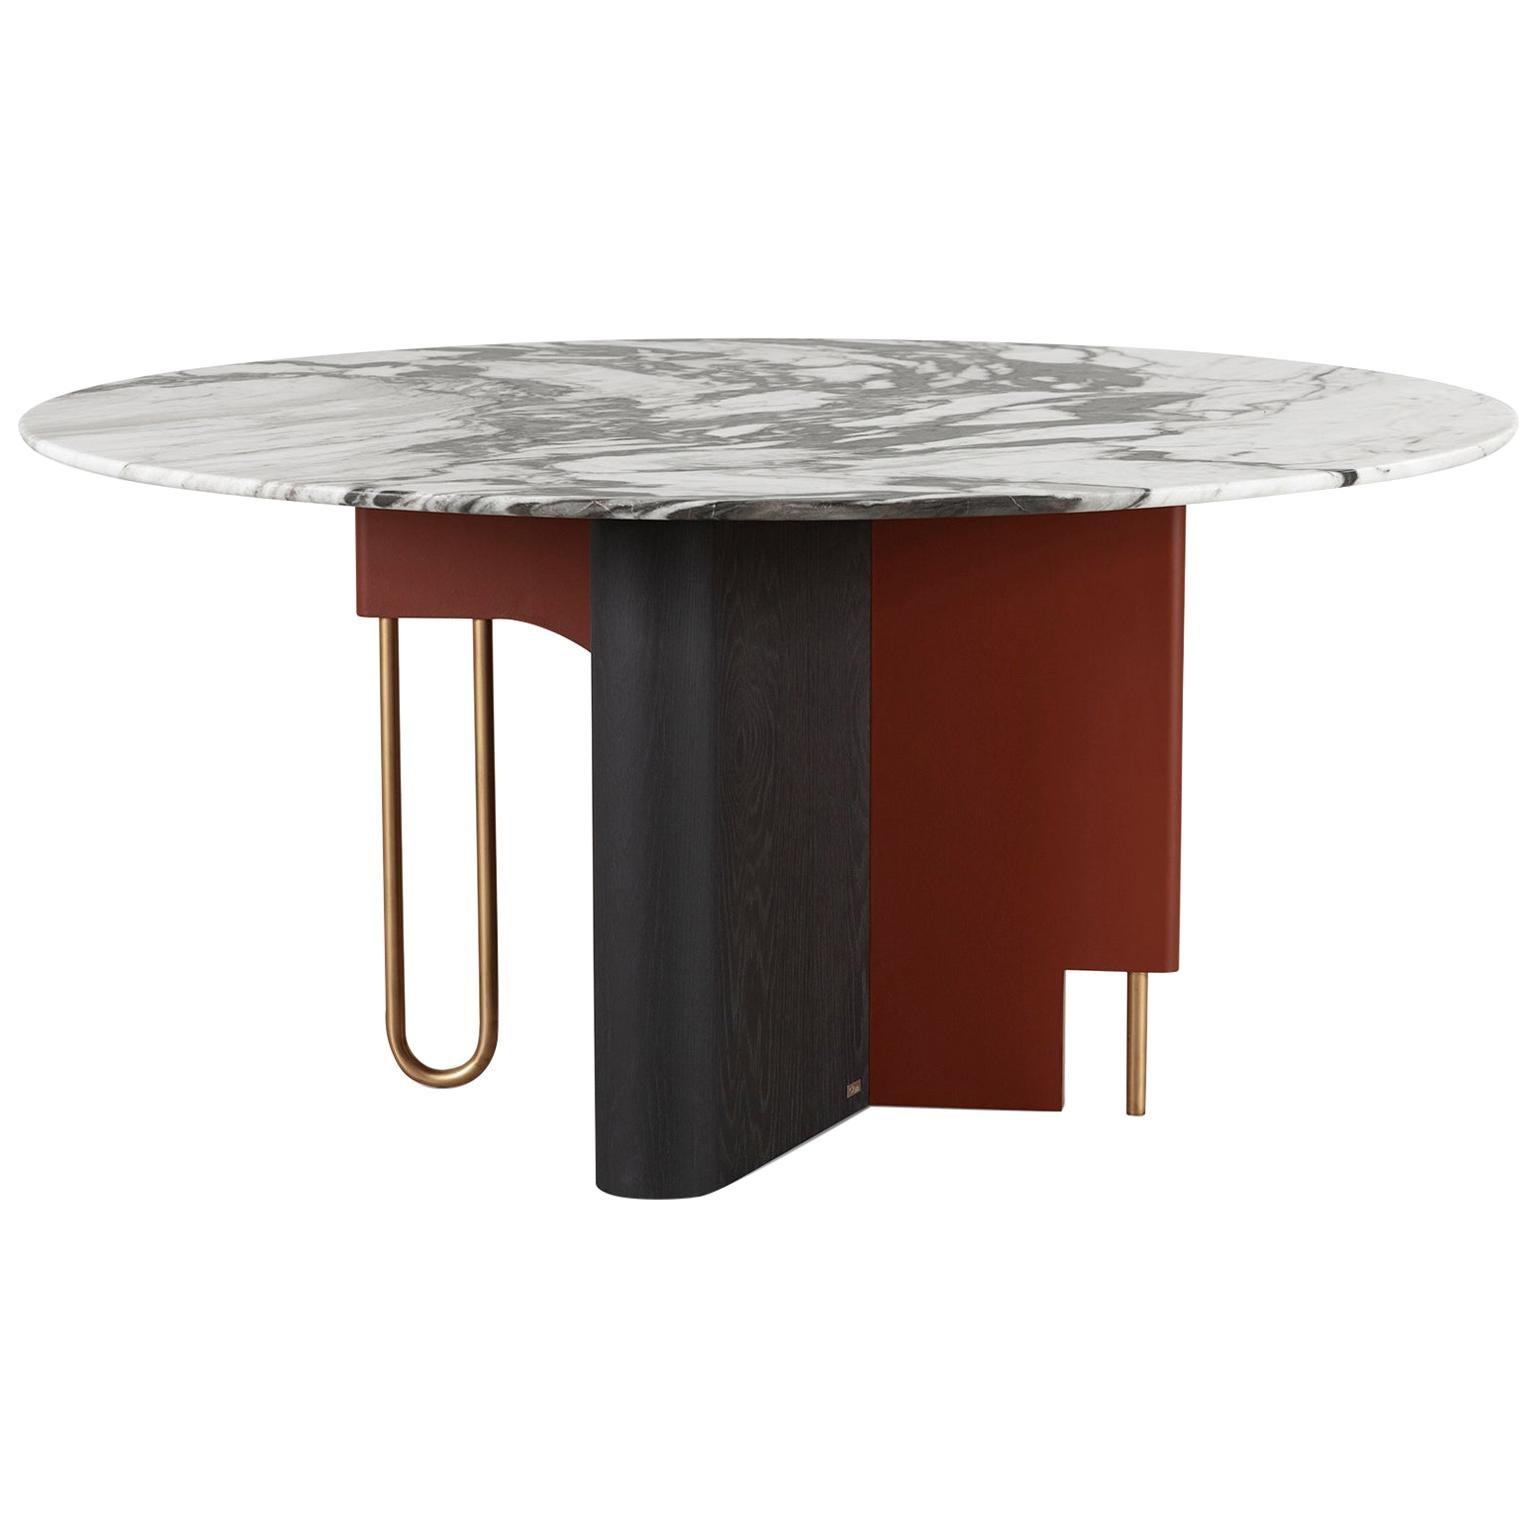 Ferreirinha 8-Seat Round Dining Table Calacatta Black Veins Leather American Oak